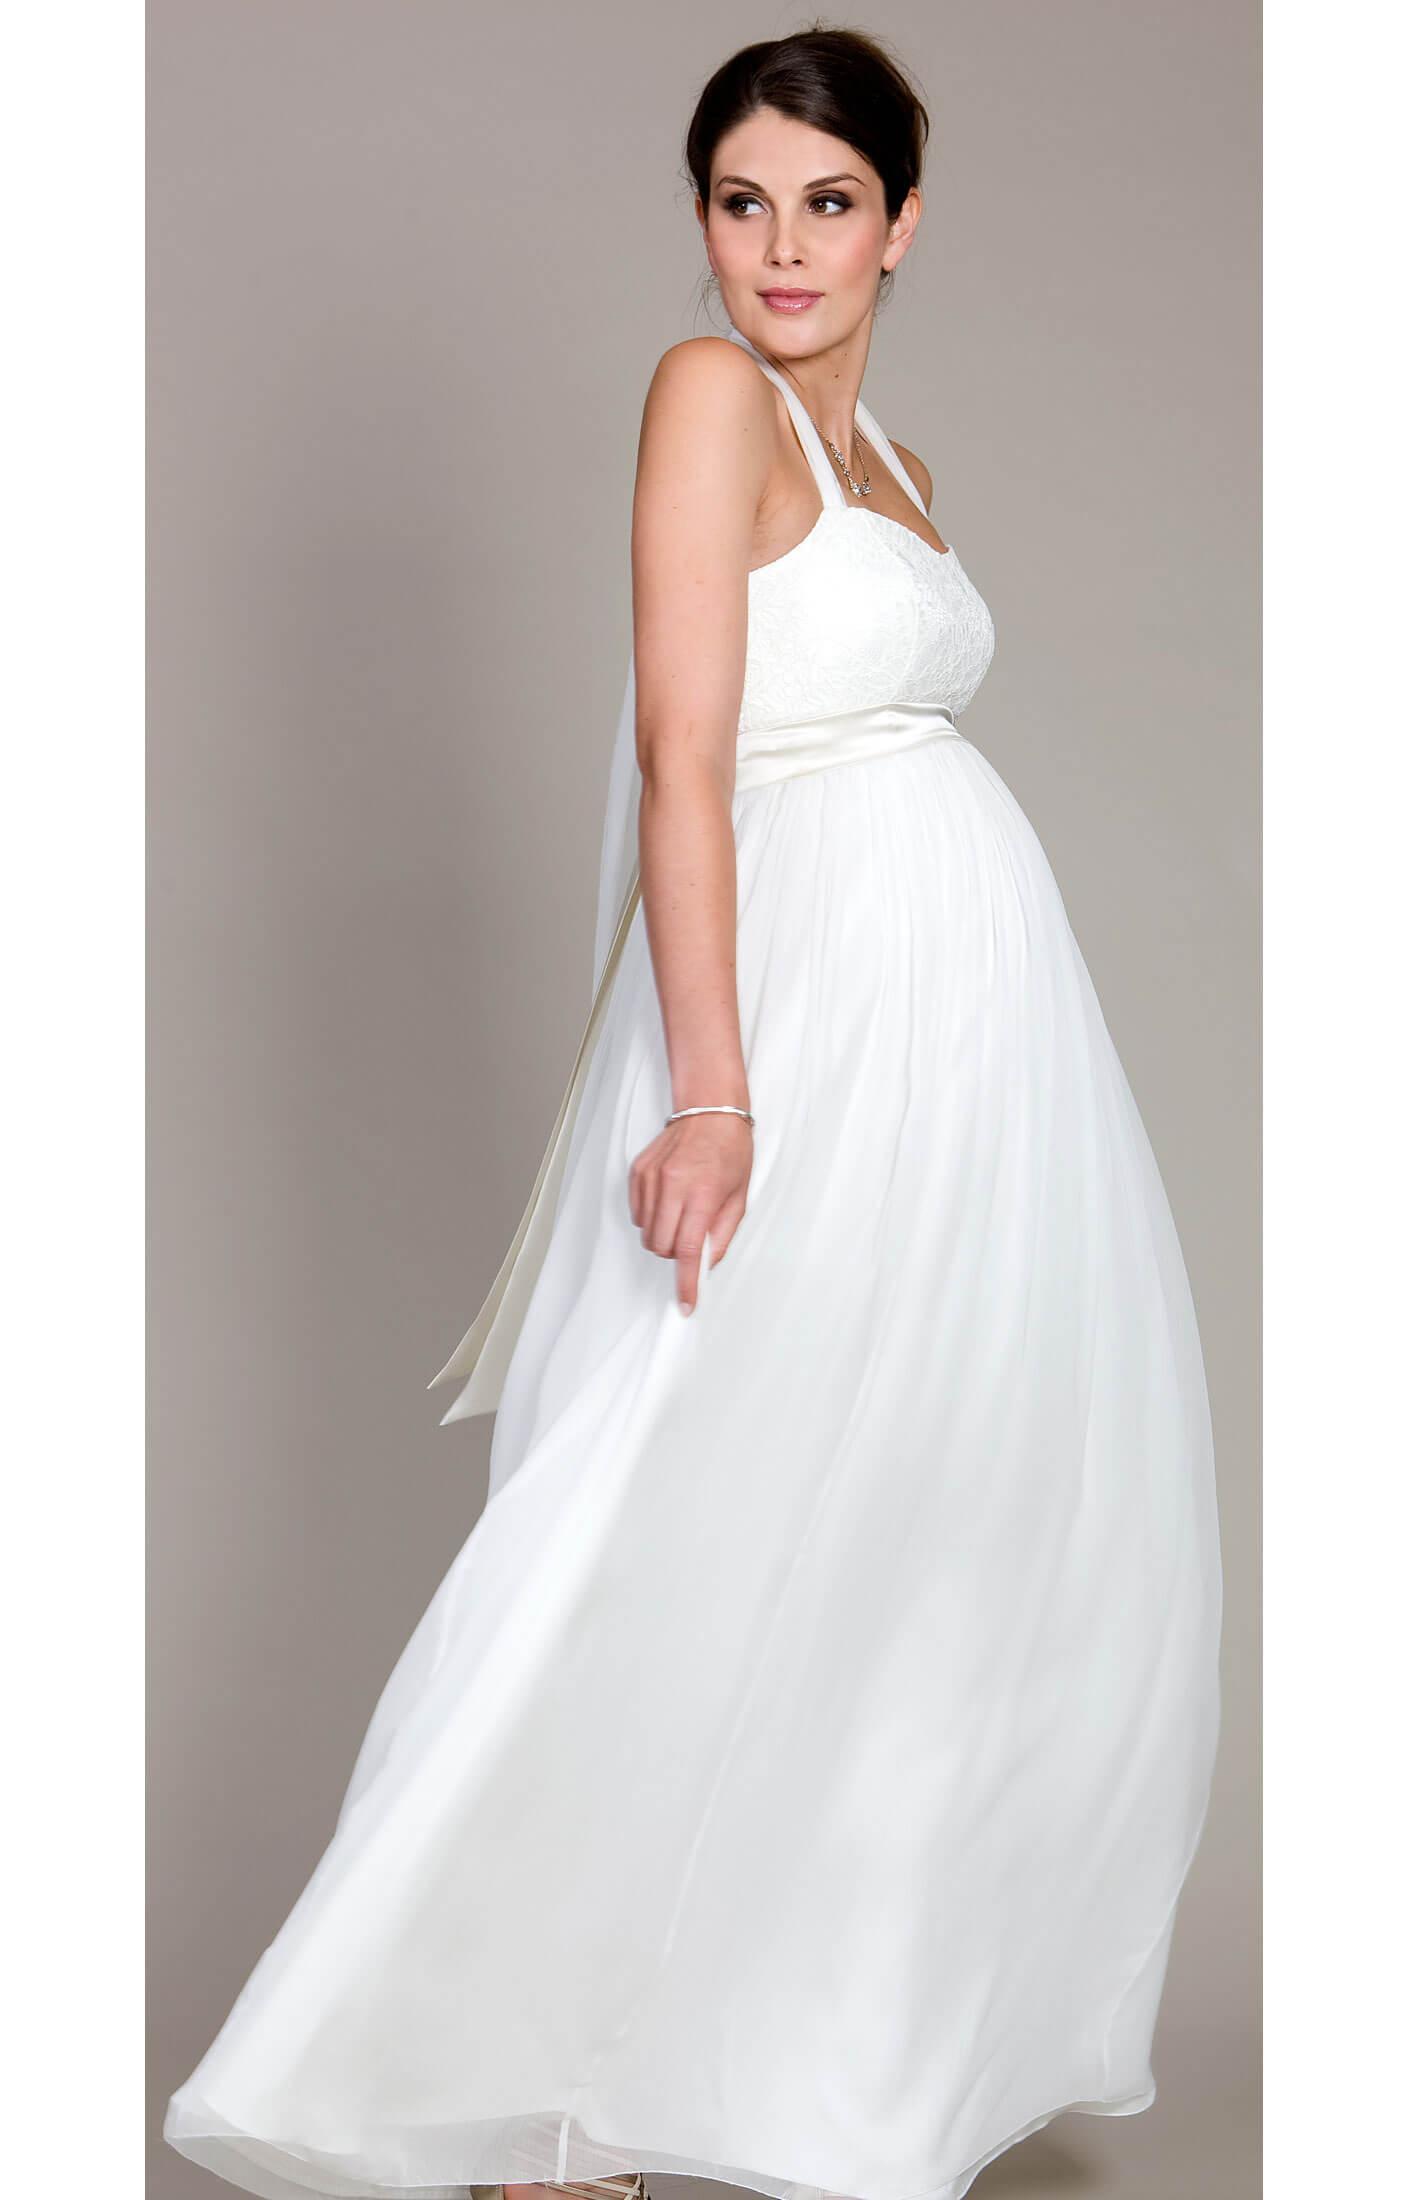 Alya Lace Maternity Wedding Dress (Long) maternity dresses for wedding Alya Lace Maternity Wedding Dress Long by Tiffany Rose